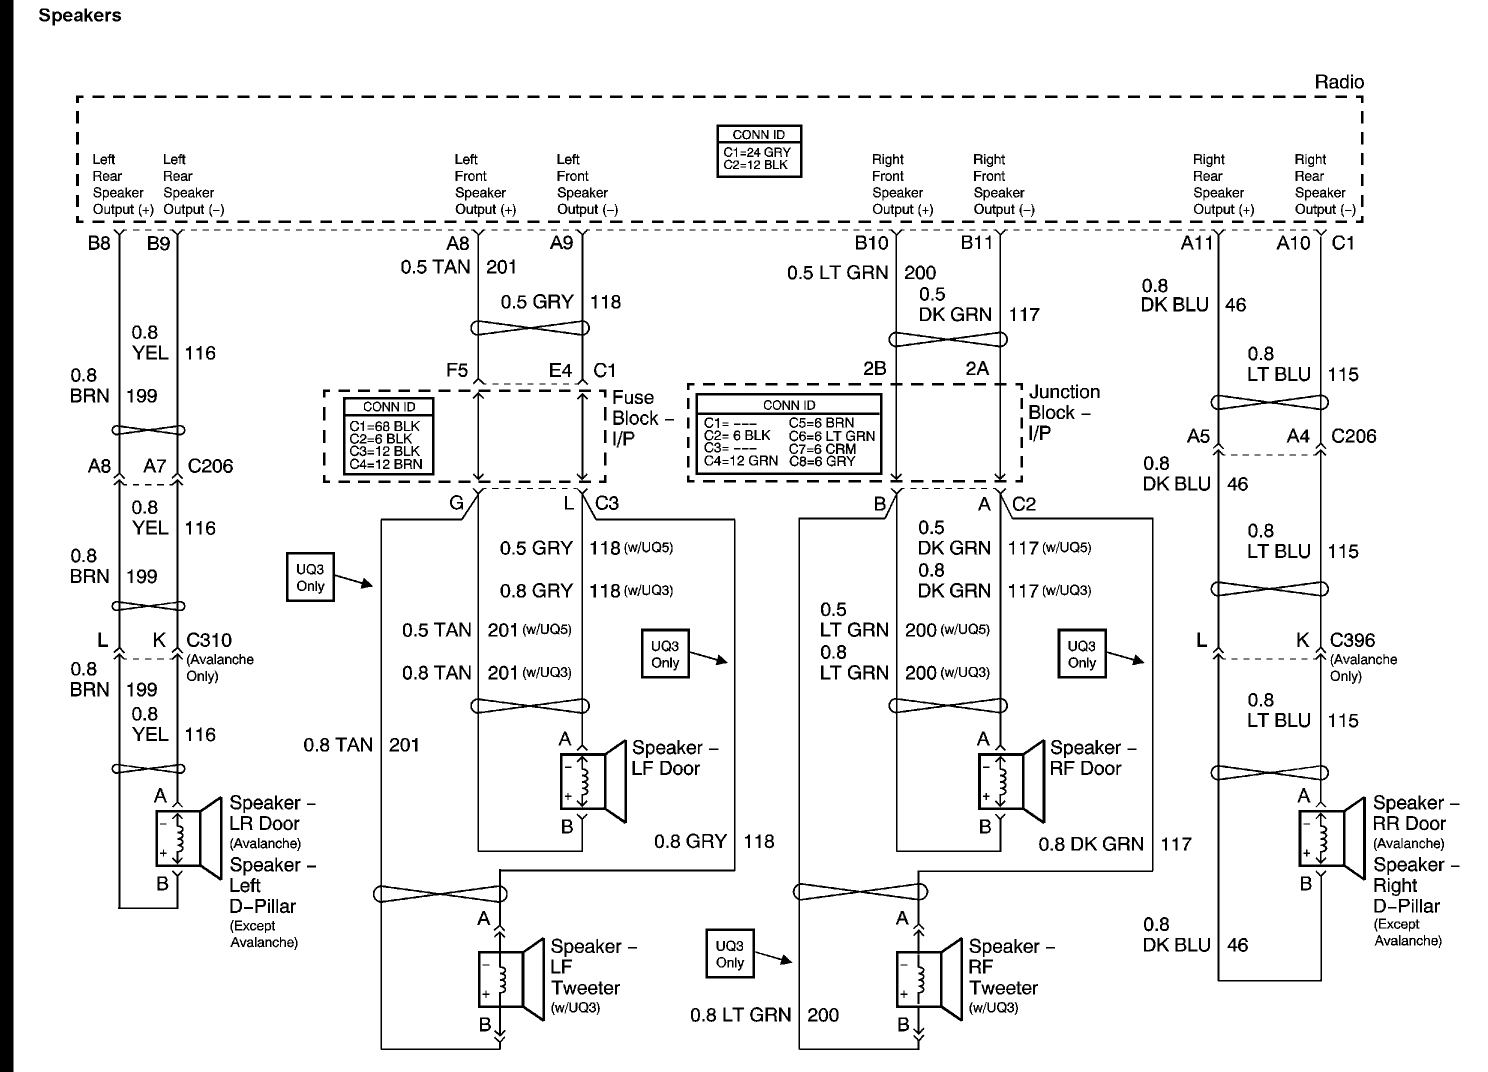 2004 Chevrolet C5500 Wiring Harness - Wiring Diagrams Hubs - 2004 Chevy Silverado Trailer Wiring Diagram